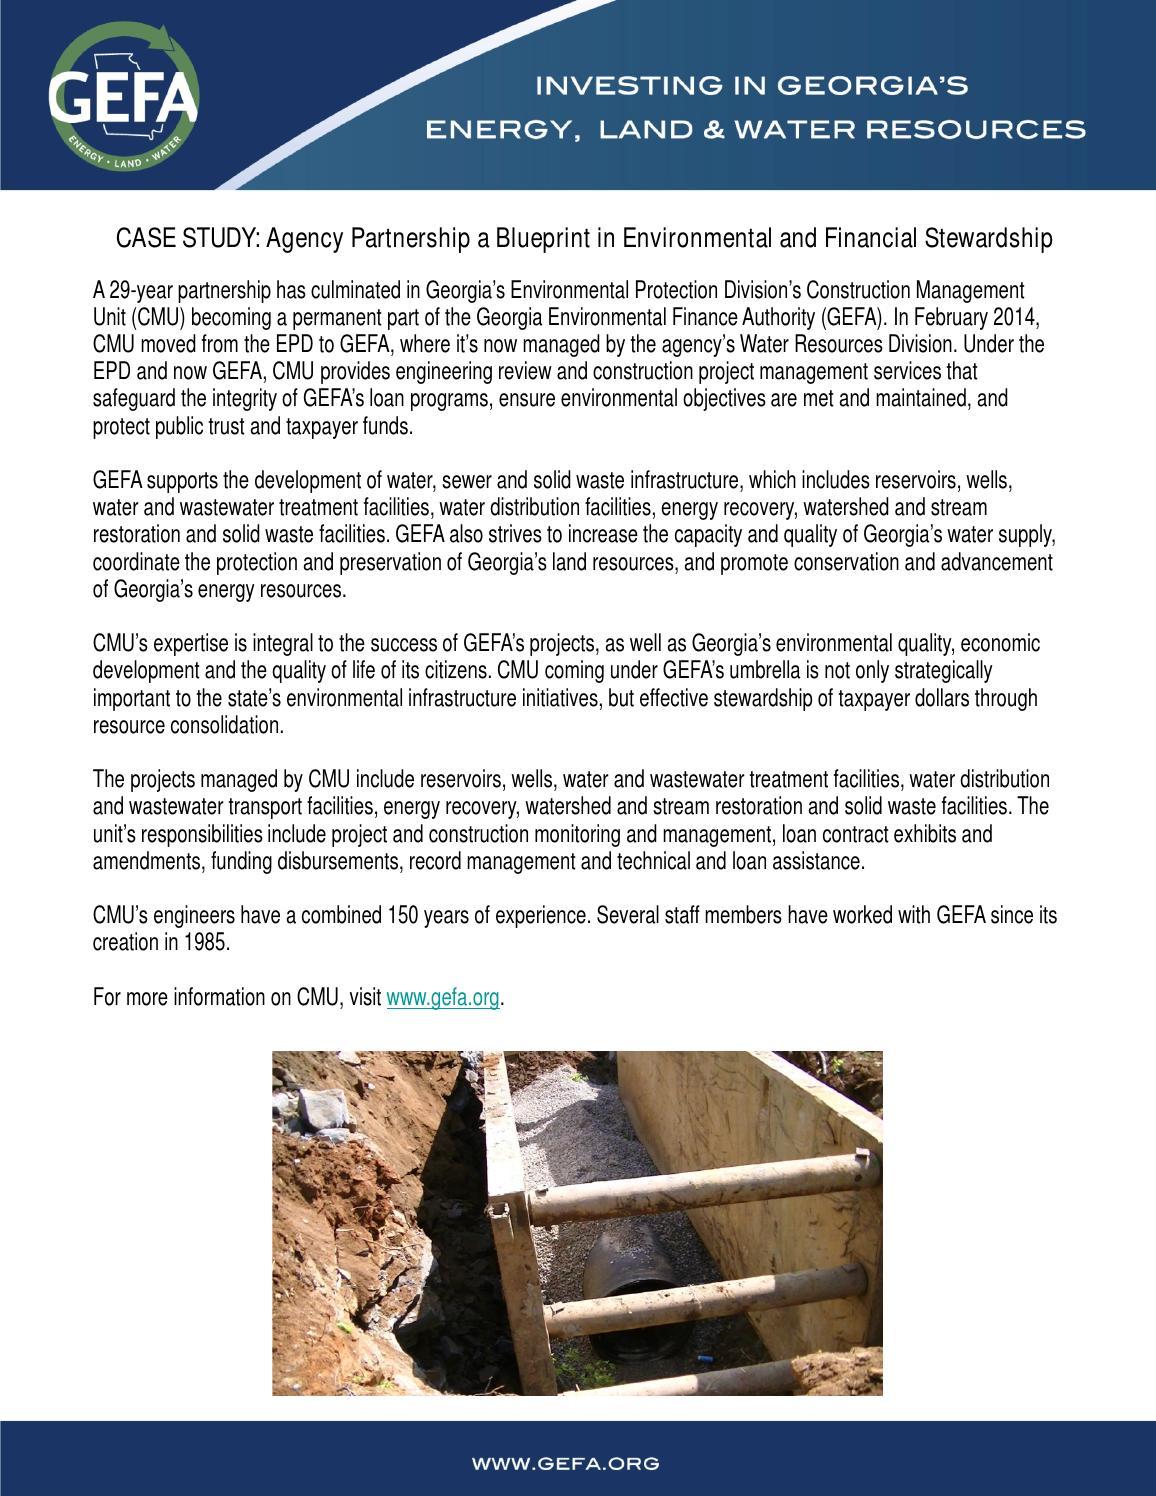 Construction management unit joins gefa by georgia environmental construction management unit joins gefa by georgia environmental finance authority gefa issuu malvernweather Image collections